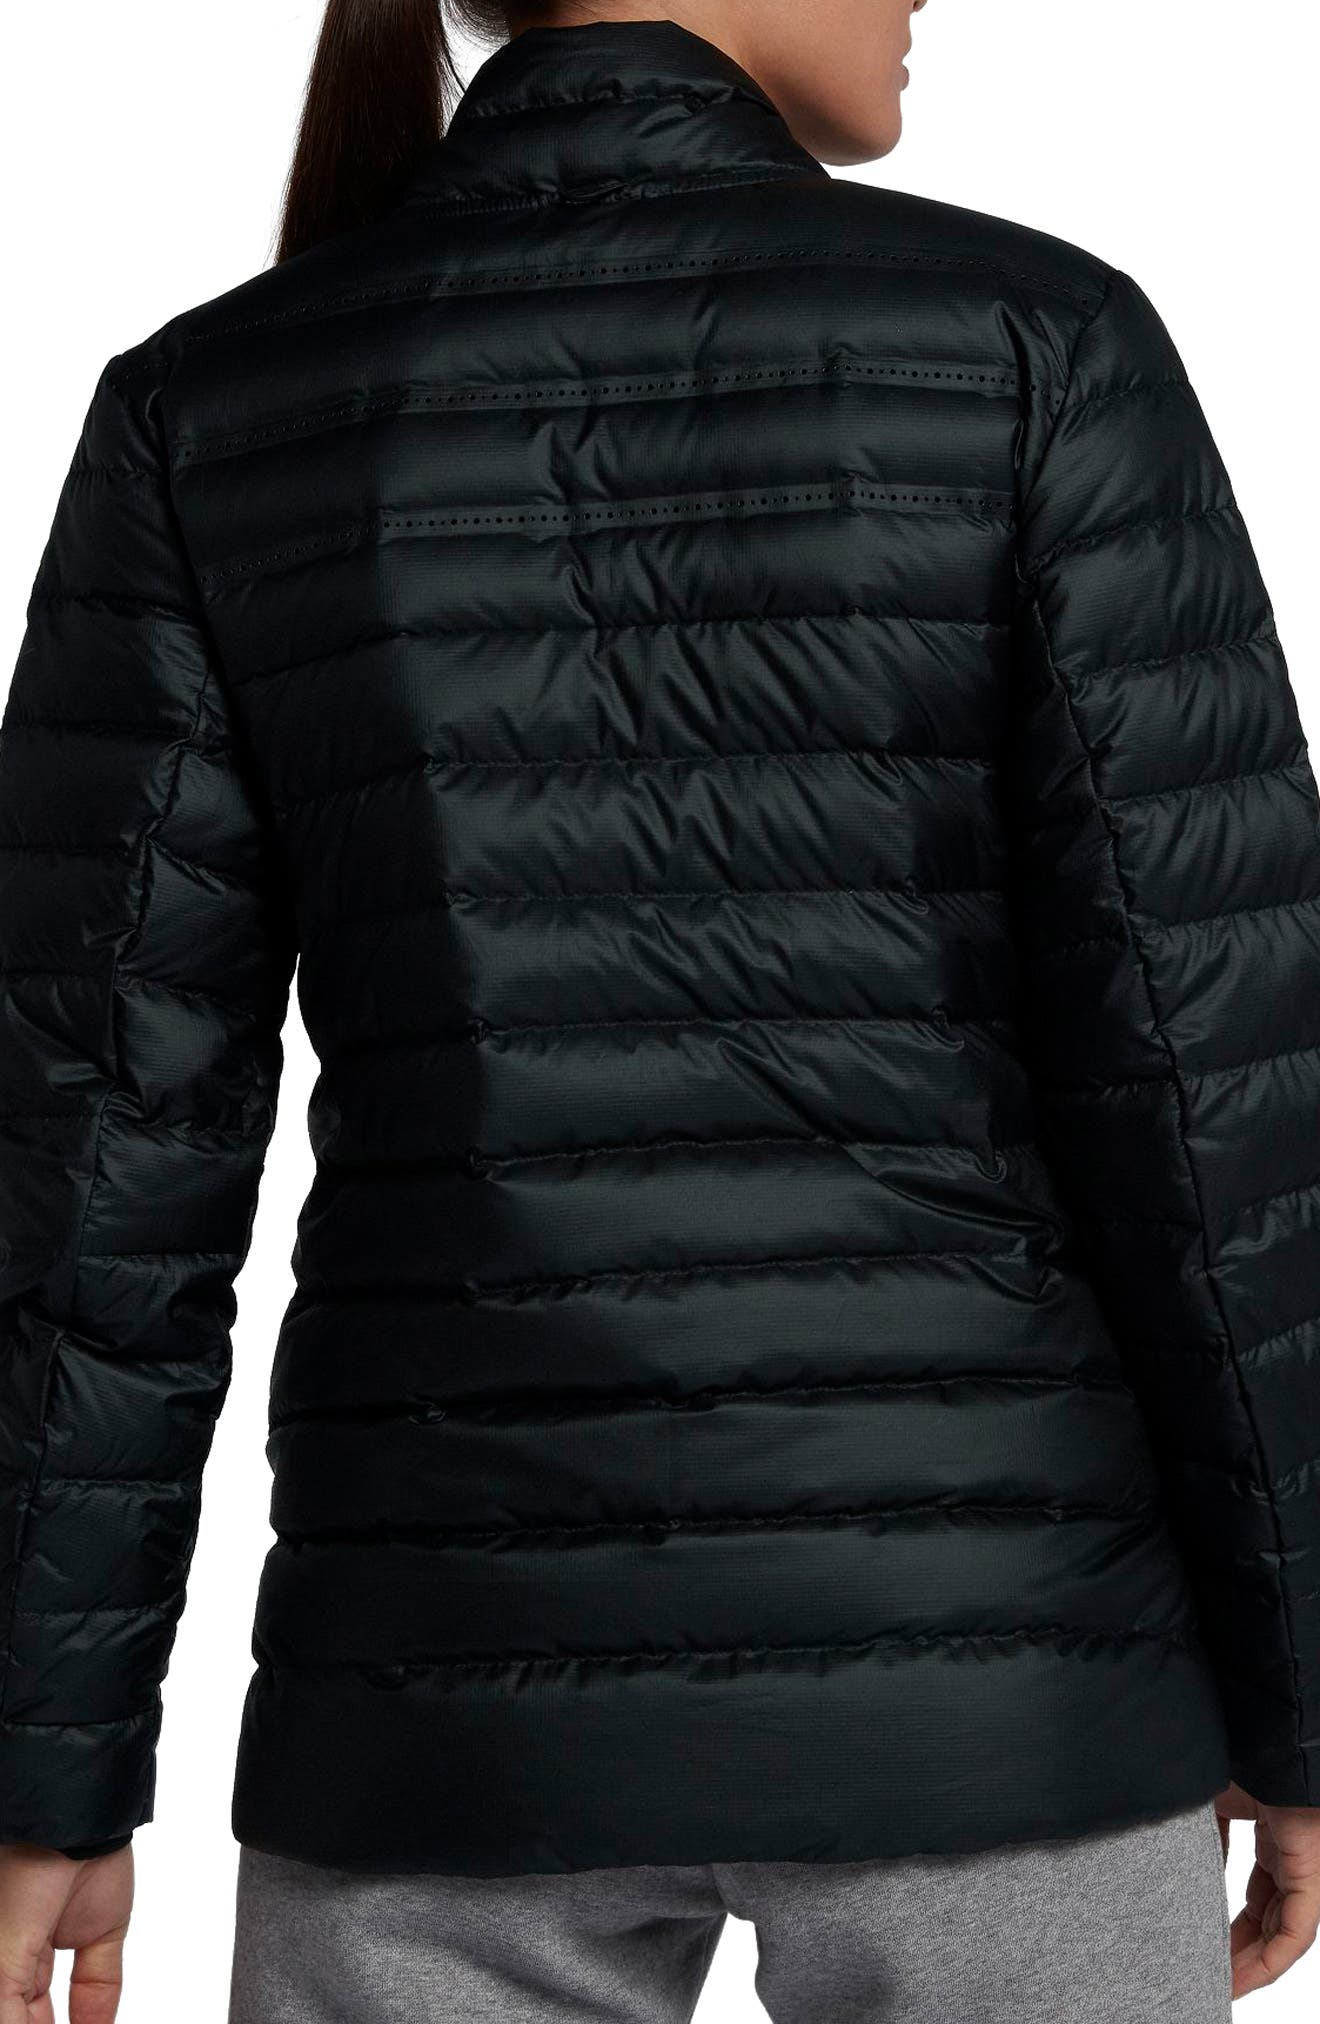 Sportswear AeroLoft 3-in-1 Down Jacket,                             Alternate thumbnail 9, color,                             Black/ Black/ Black